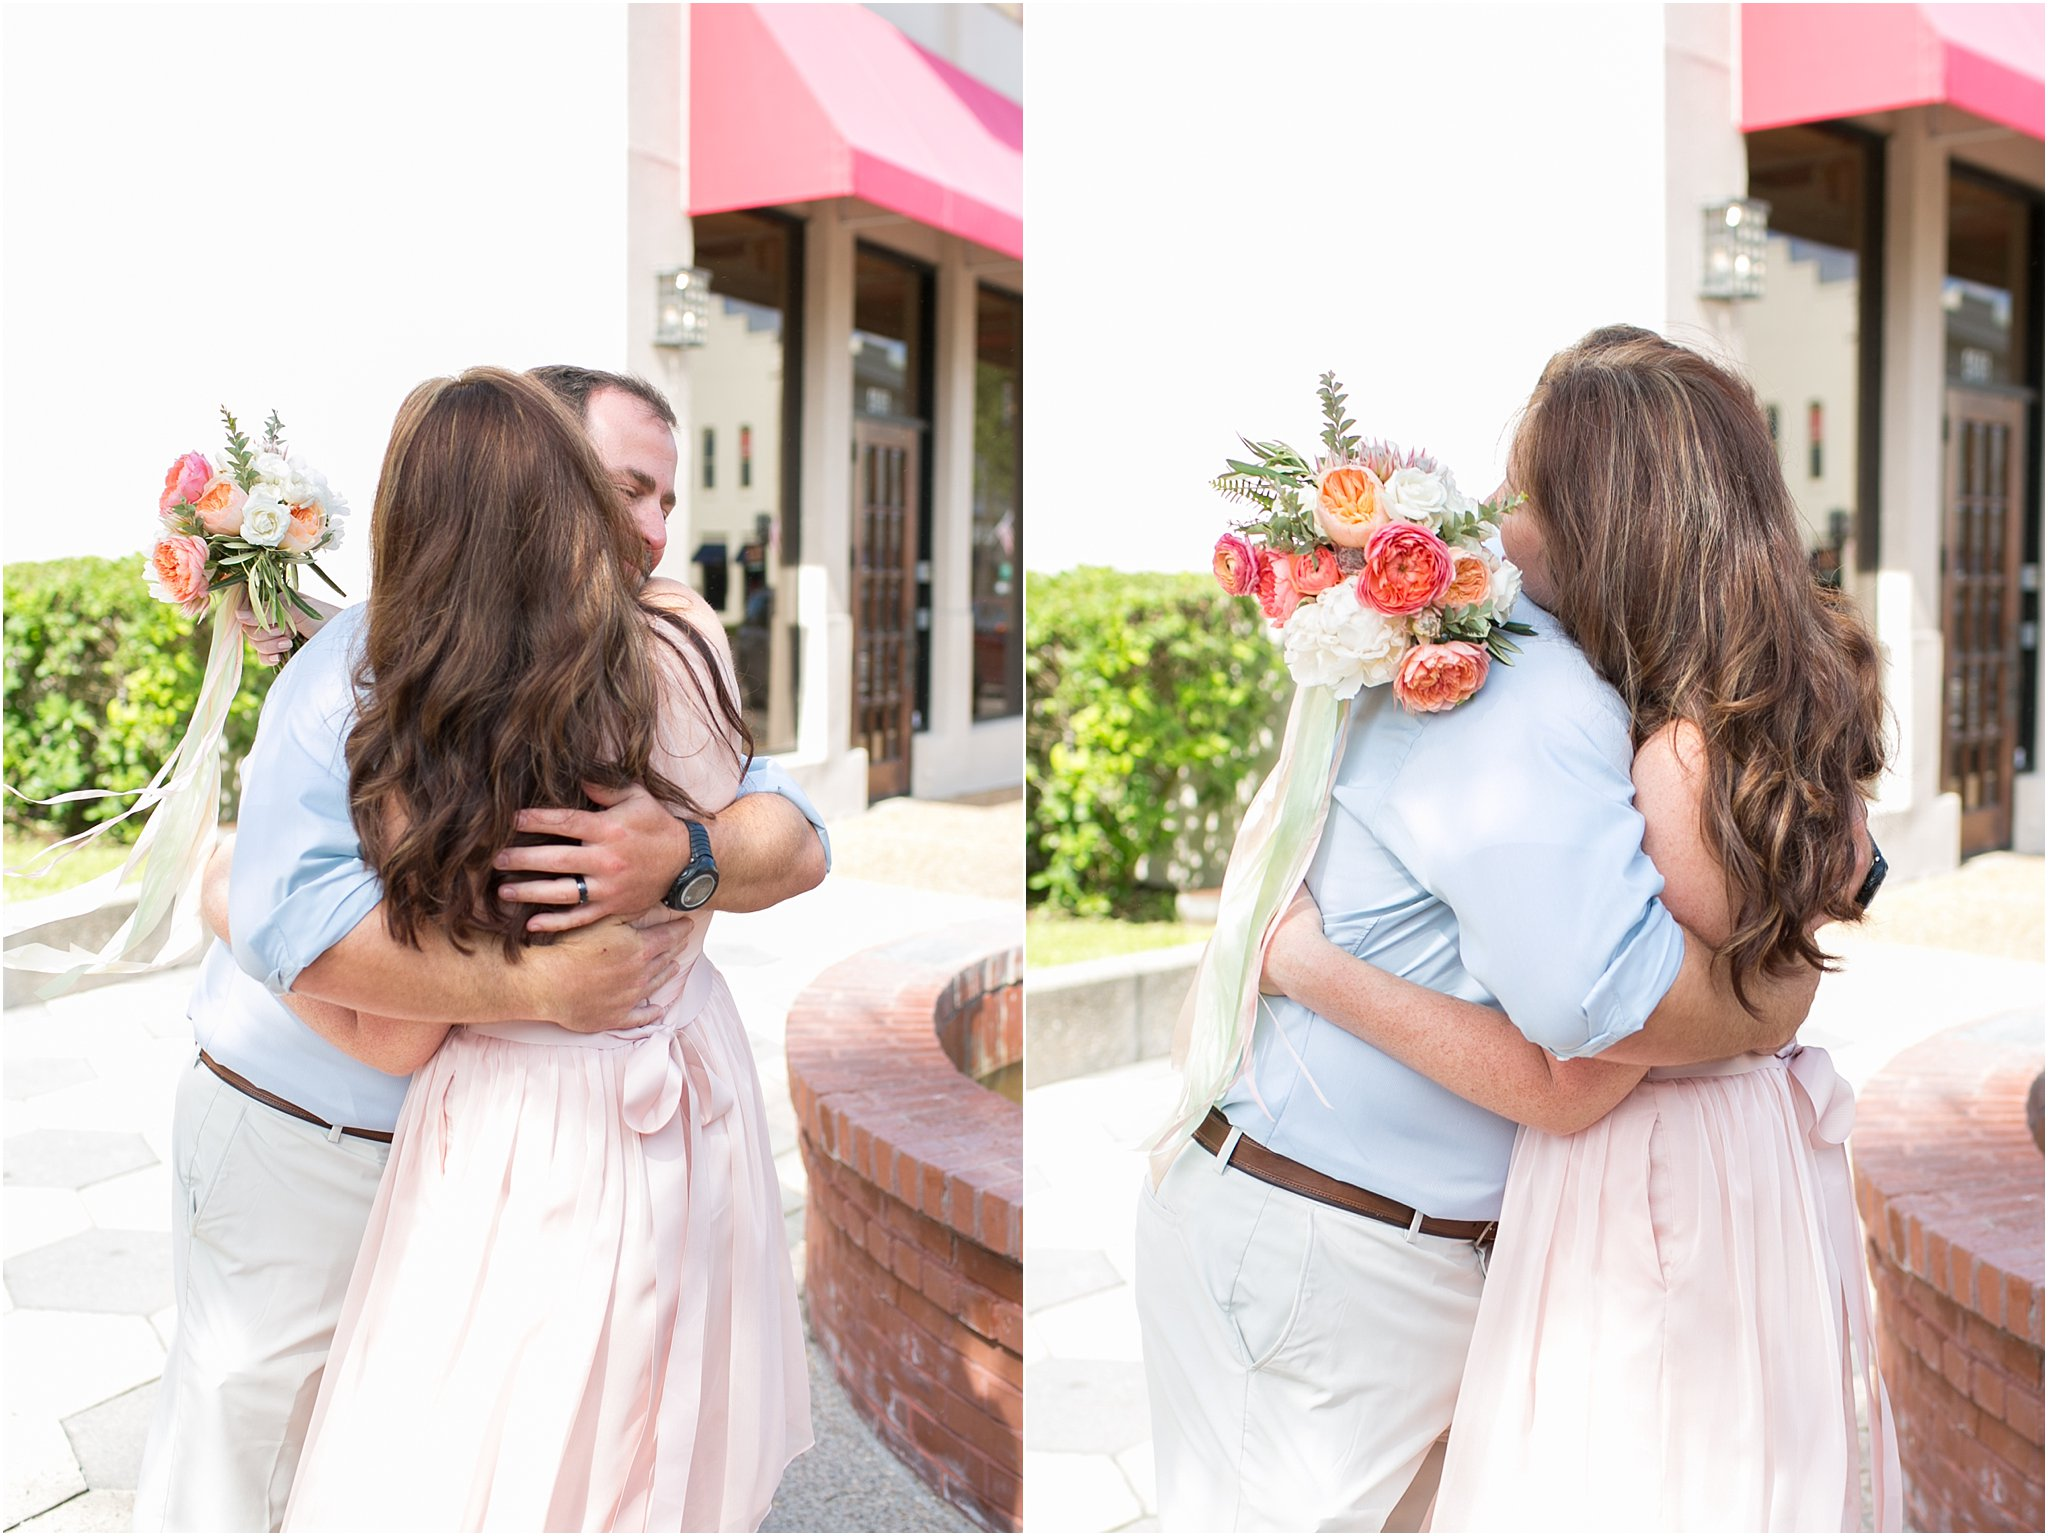 jessica_ryan_photography_wedding_photographs_virginia_fernandina_beach_florida_wedding_2105